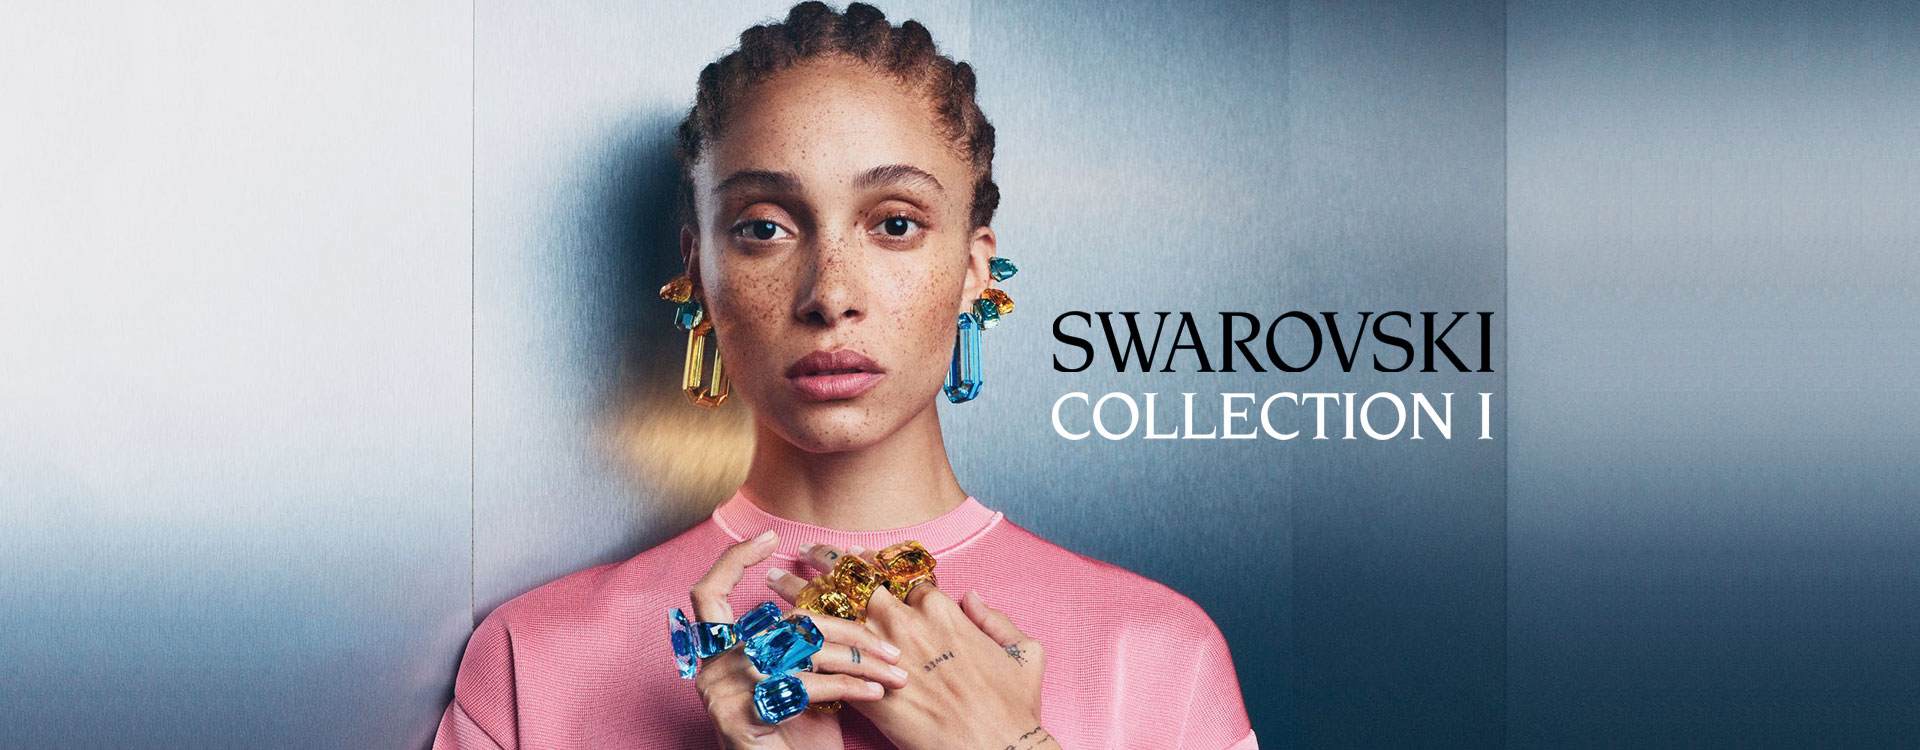 swarovski-collection-1